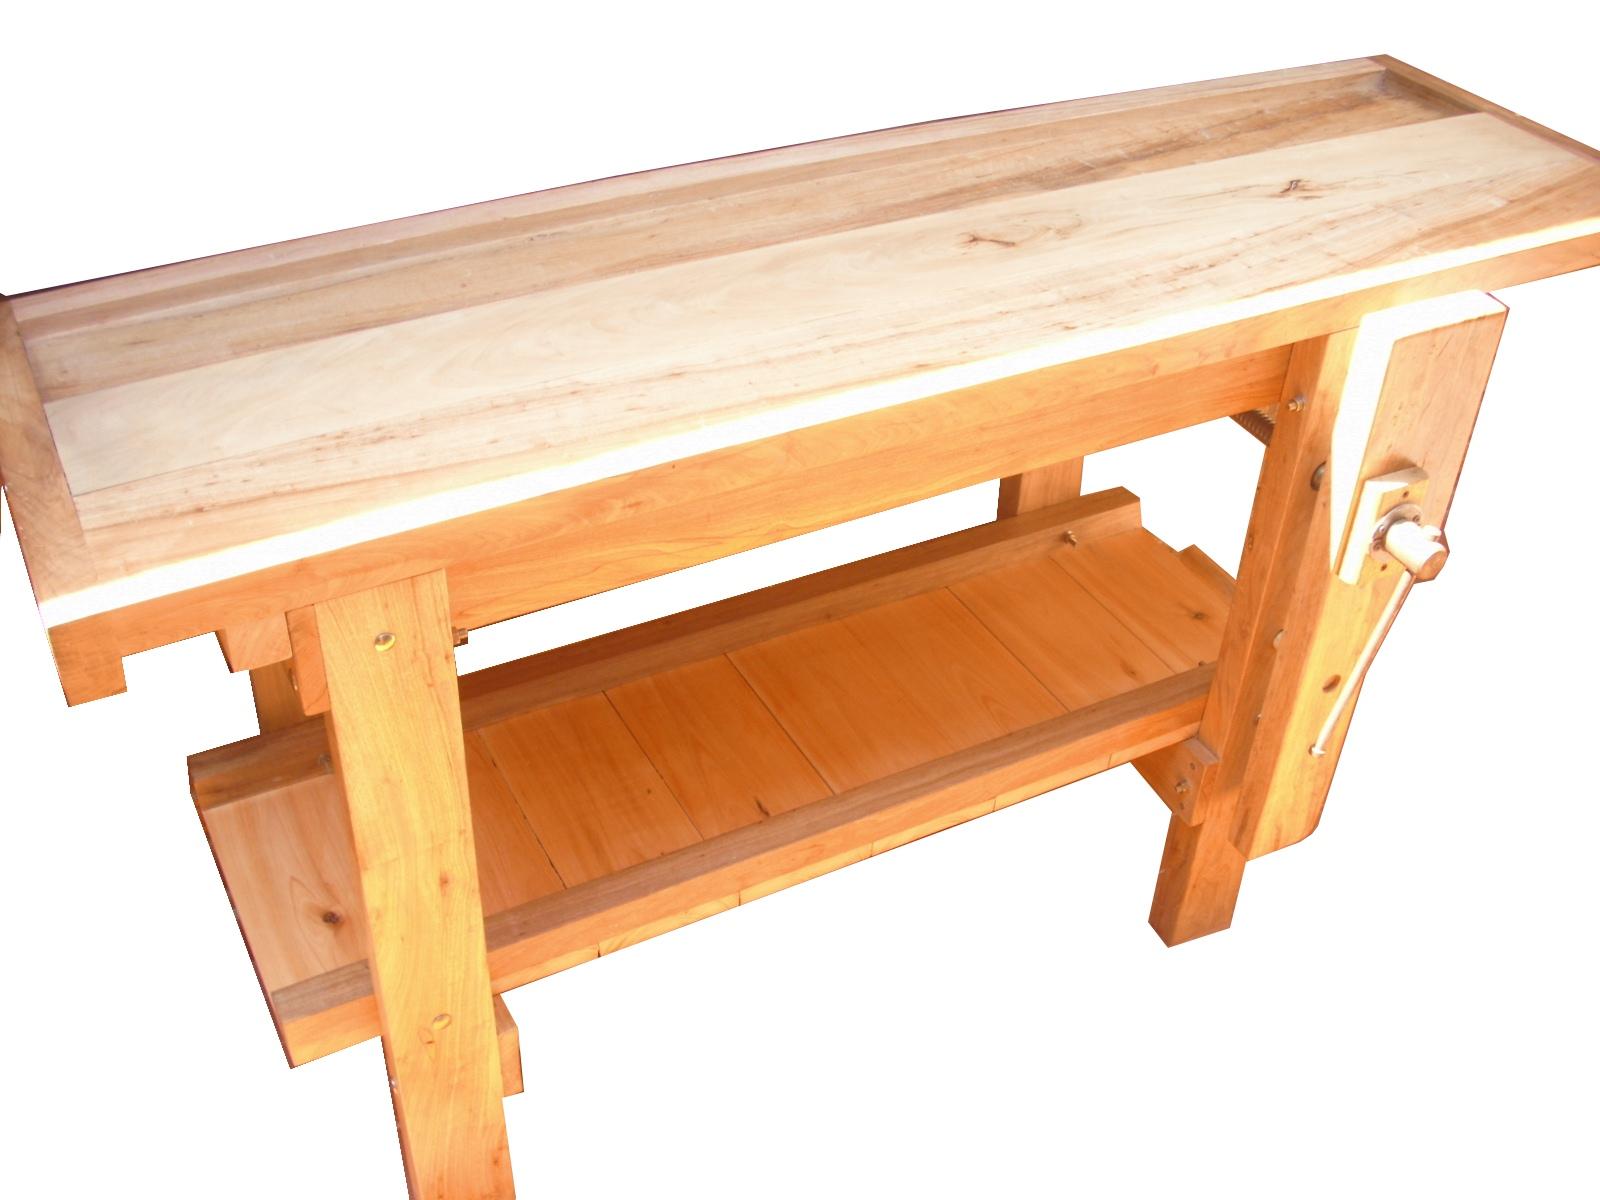 Banco de carpintero en madera dura carpinterof - Carpintero de madera ...